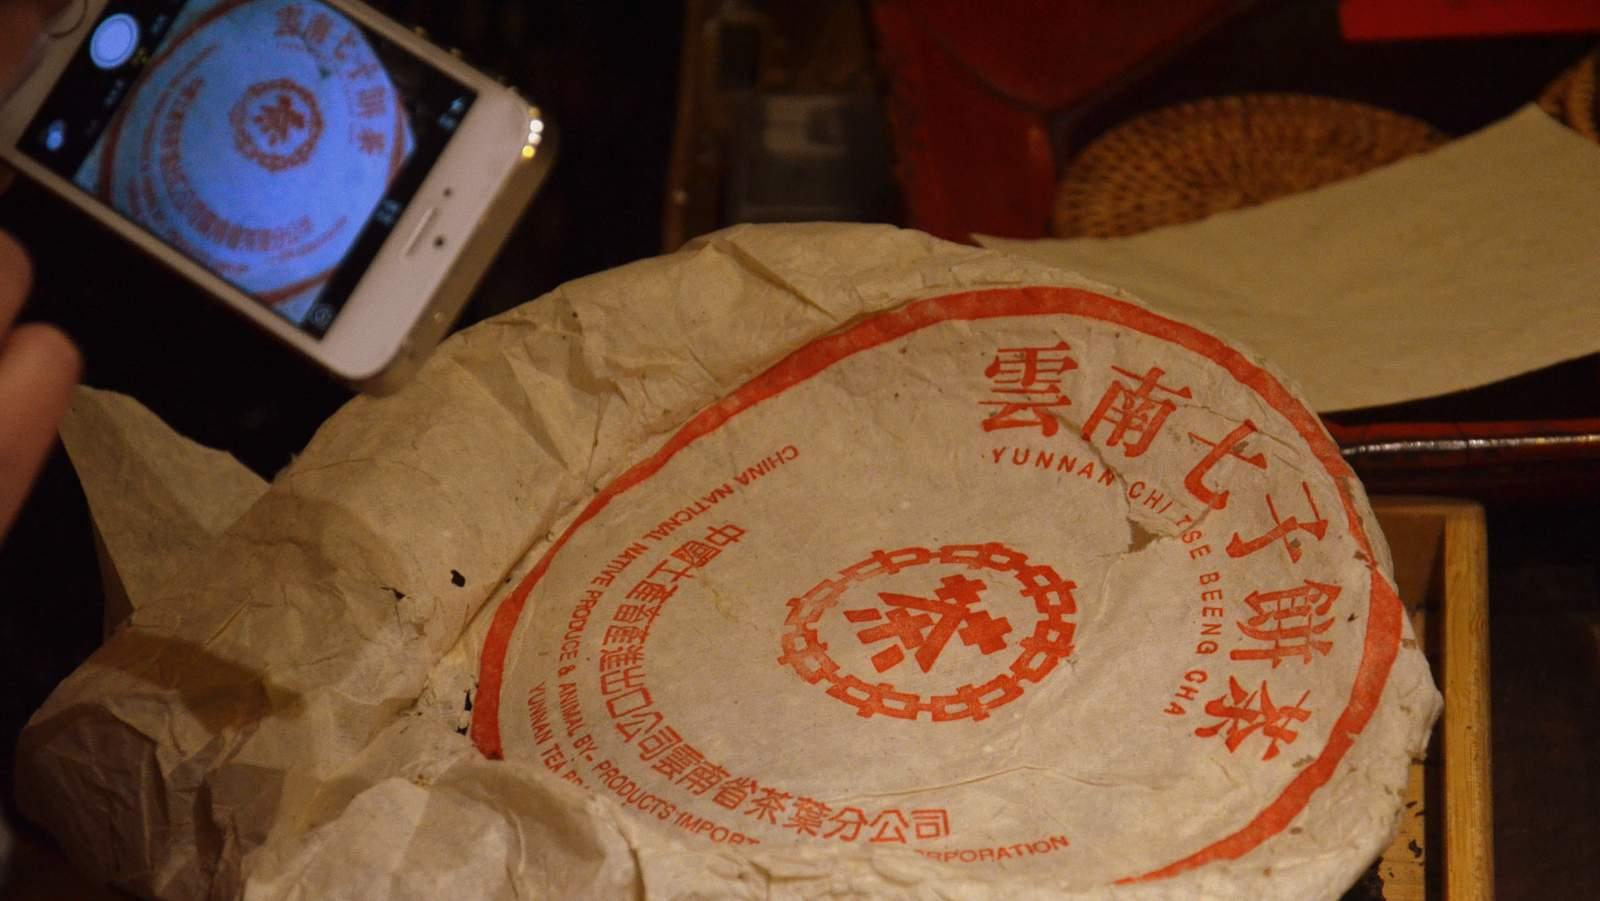 CNNP raw Pu-erh blend 7542, red label from 1996 of Menghai tea factory, warper